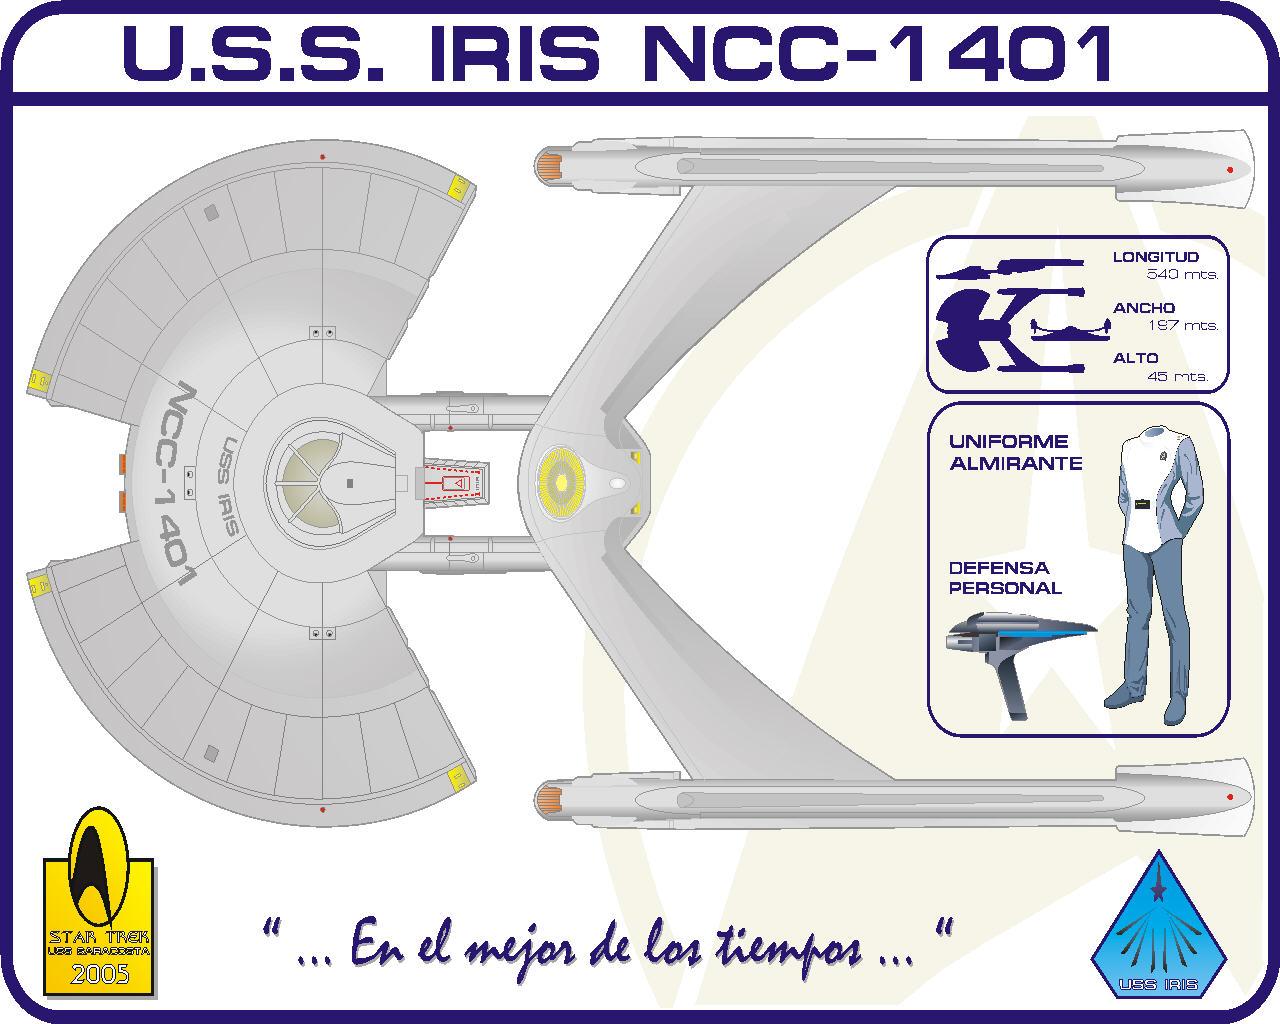 El juego de las imagenes-http://www.cygnus-x1.net/links/lcars/blueprints/saracosta/uss-irisncc-1401-color.jpg